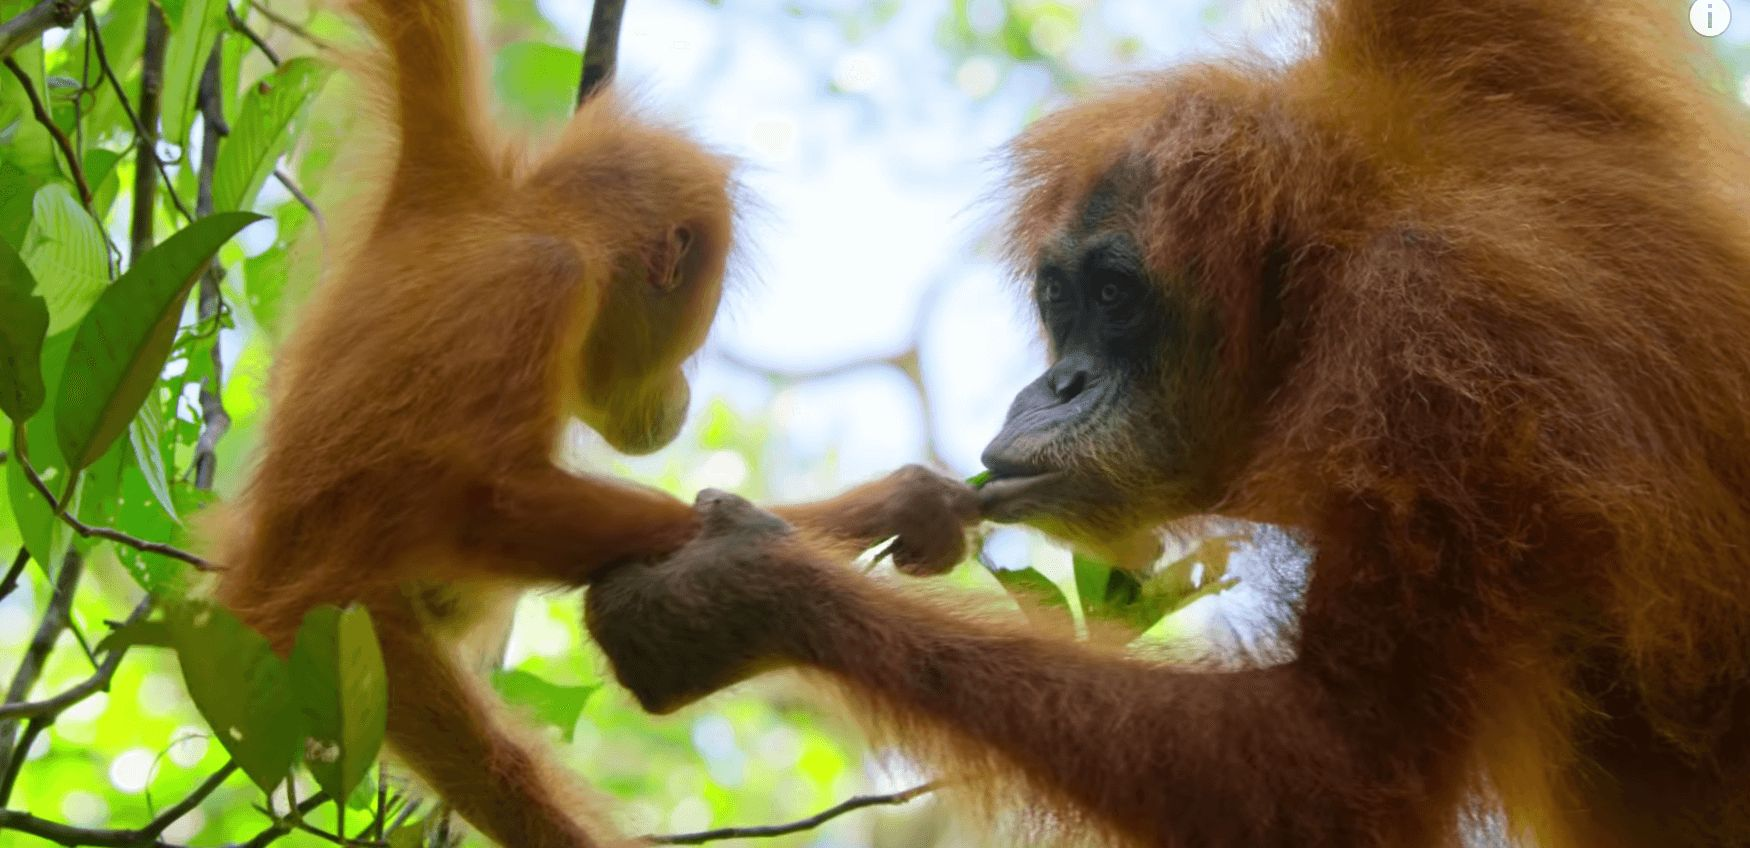 Image may contain: David Attenborough Netflix series, David Attenborough, Netflix, Our Planet, series, trailer,  Ape, Monkey, Mammal, Animal, Orangutan, Wildlife